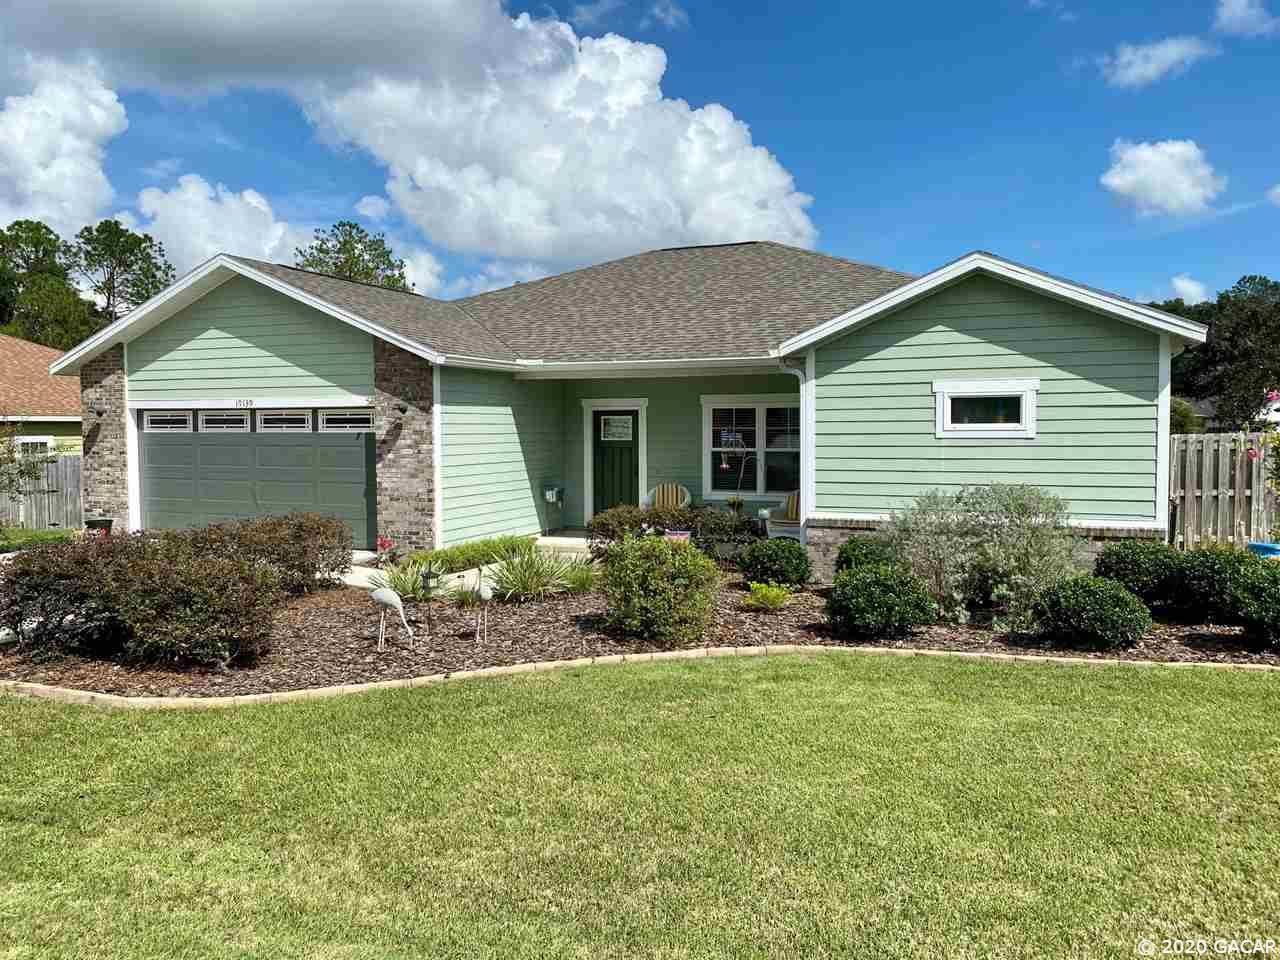 19139 NW 229th Street, High Springs, FL 32643 - #: 438600